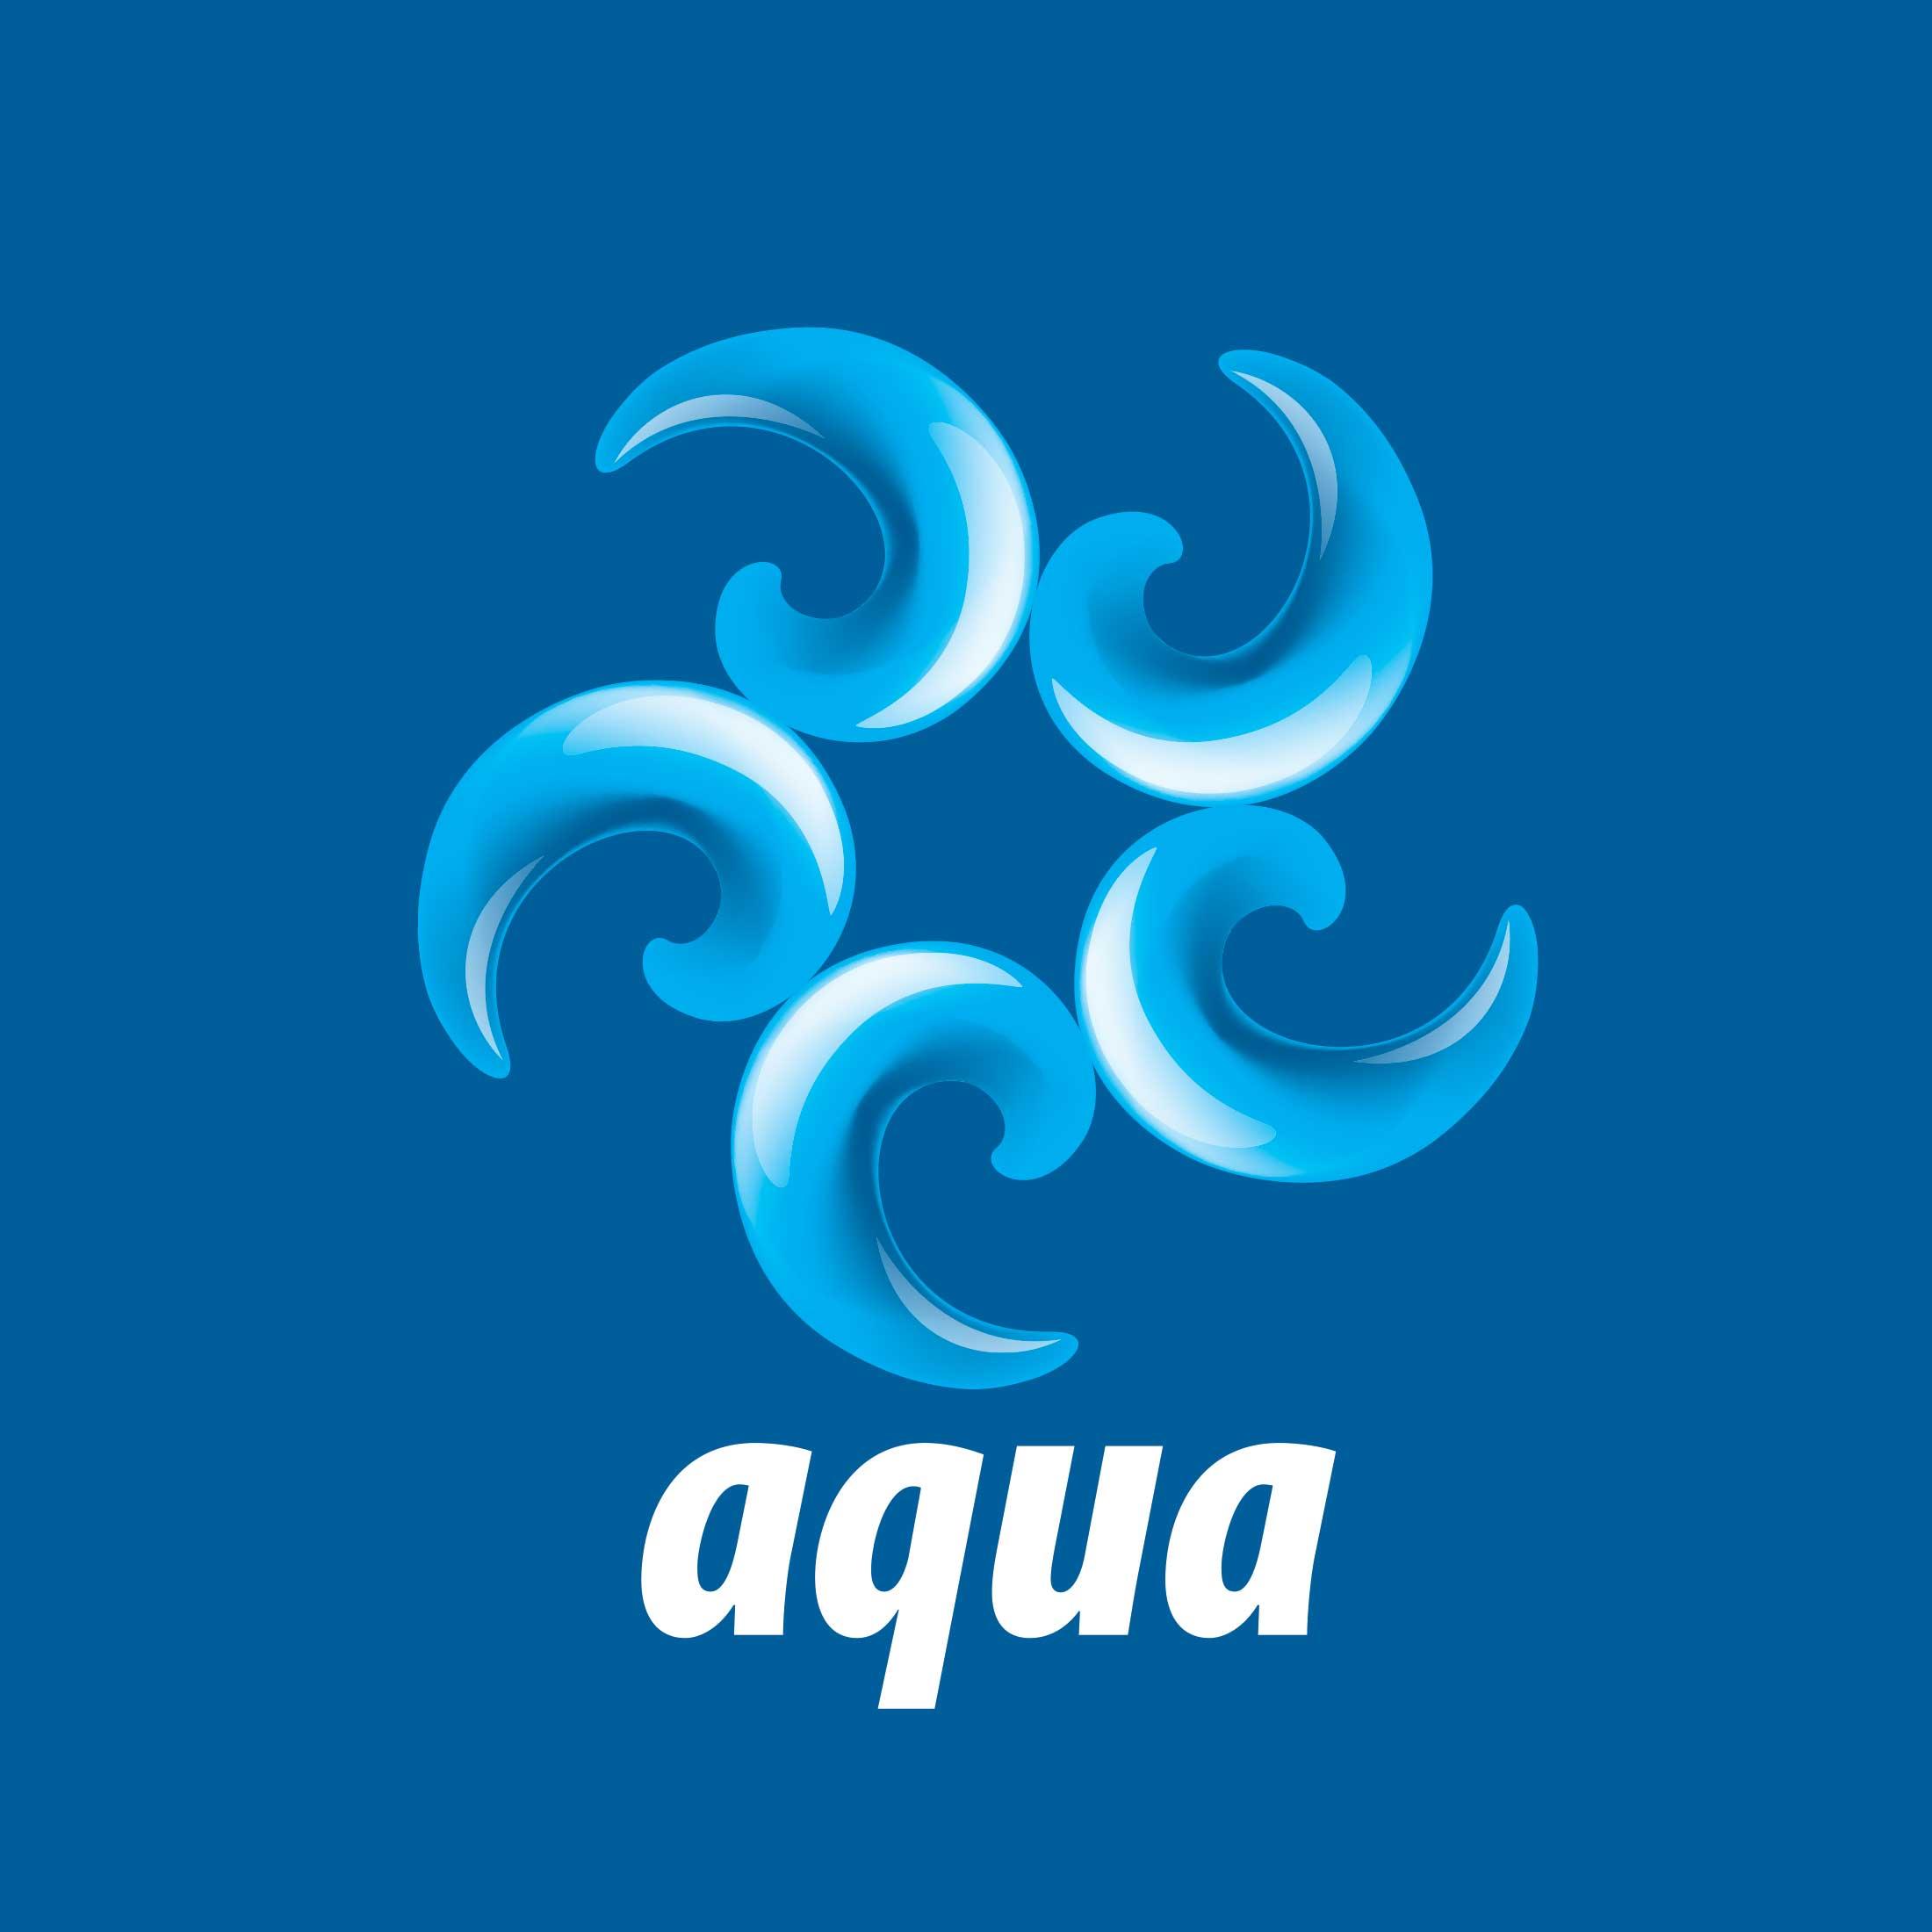 Latest-water-drop-logo-design